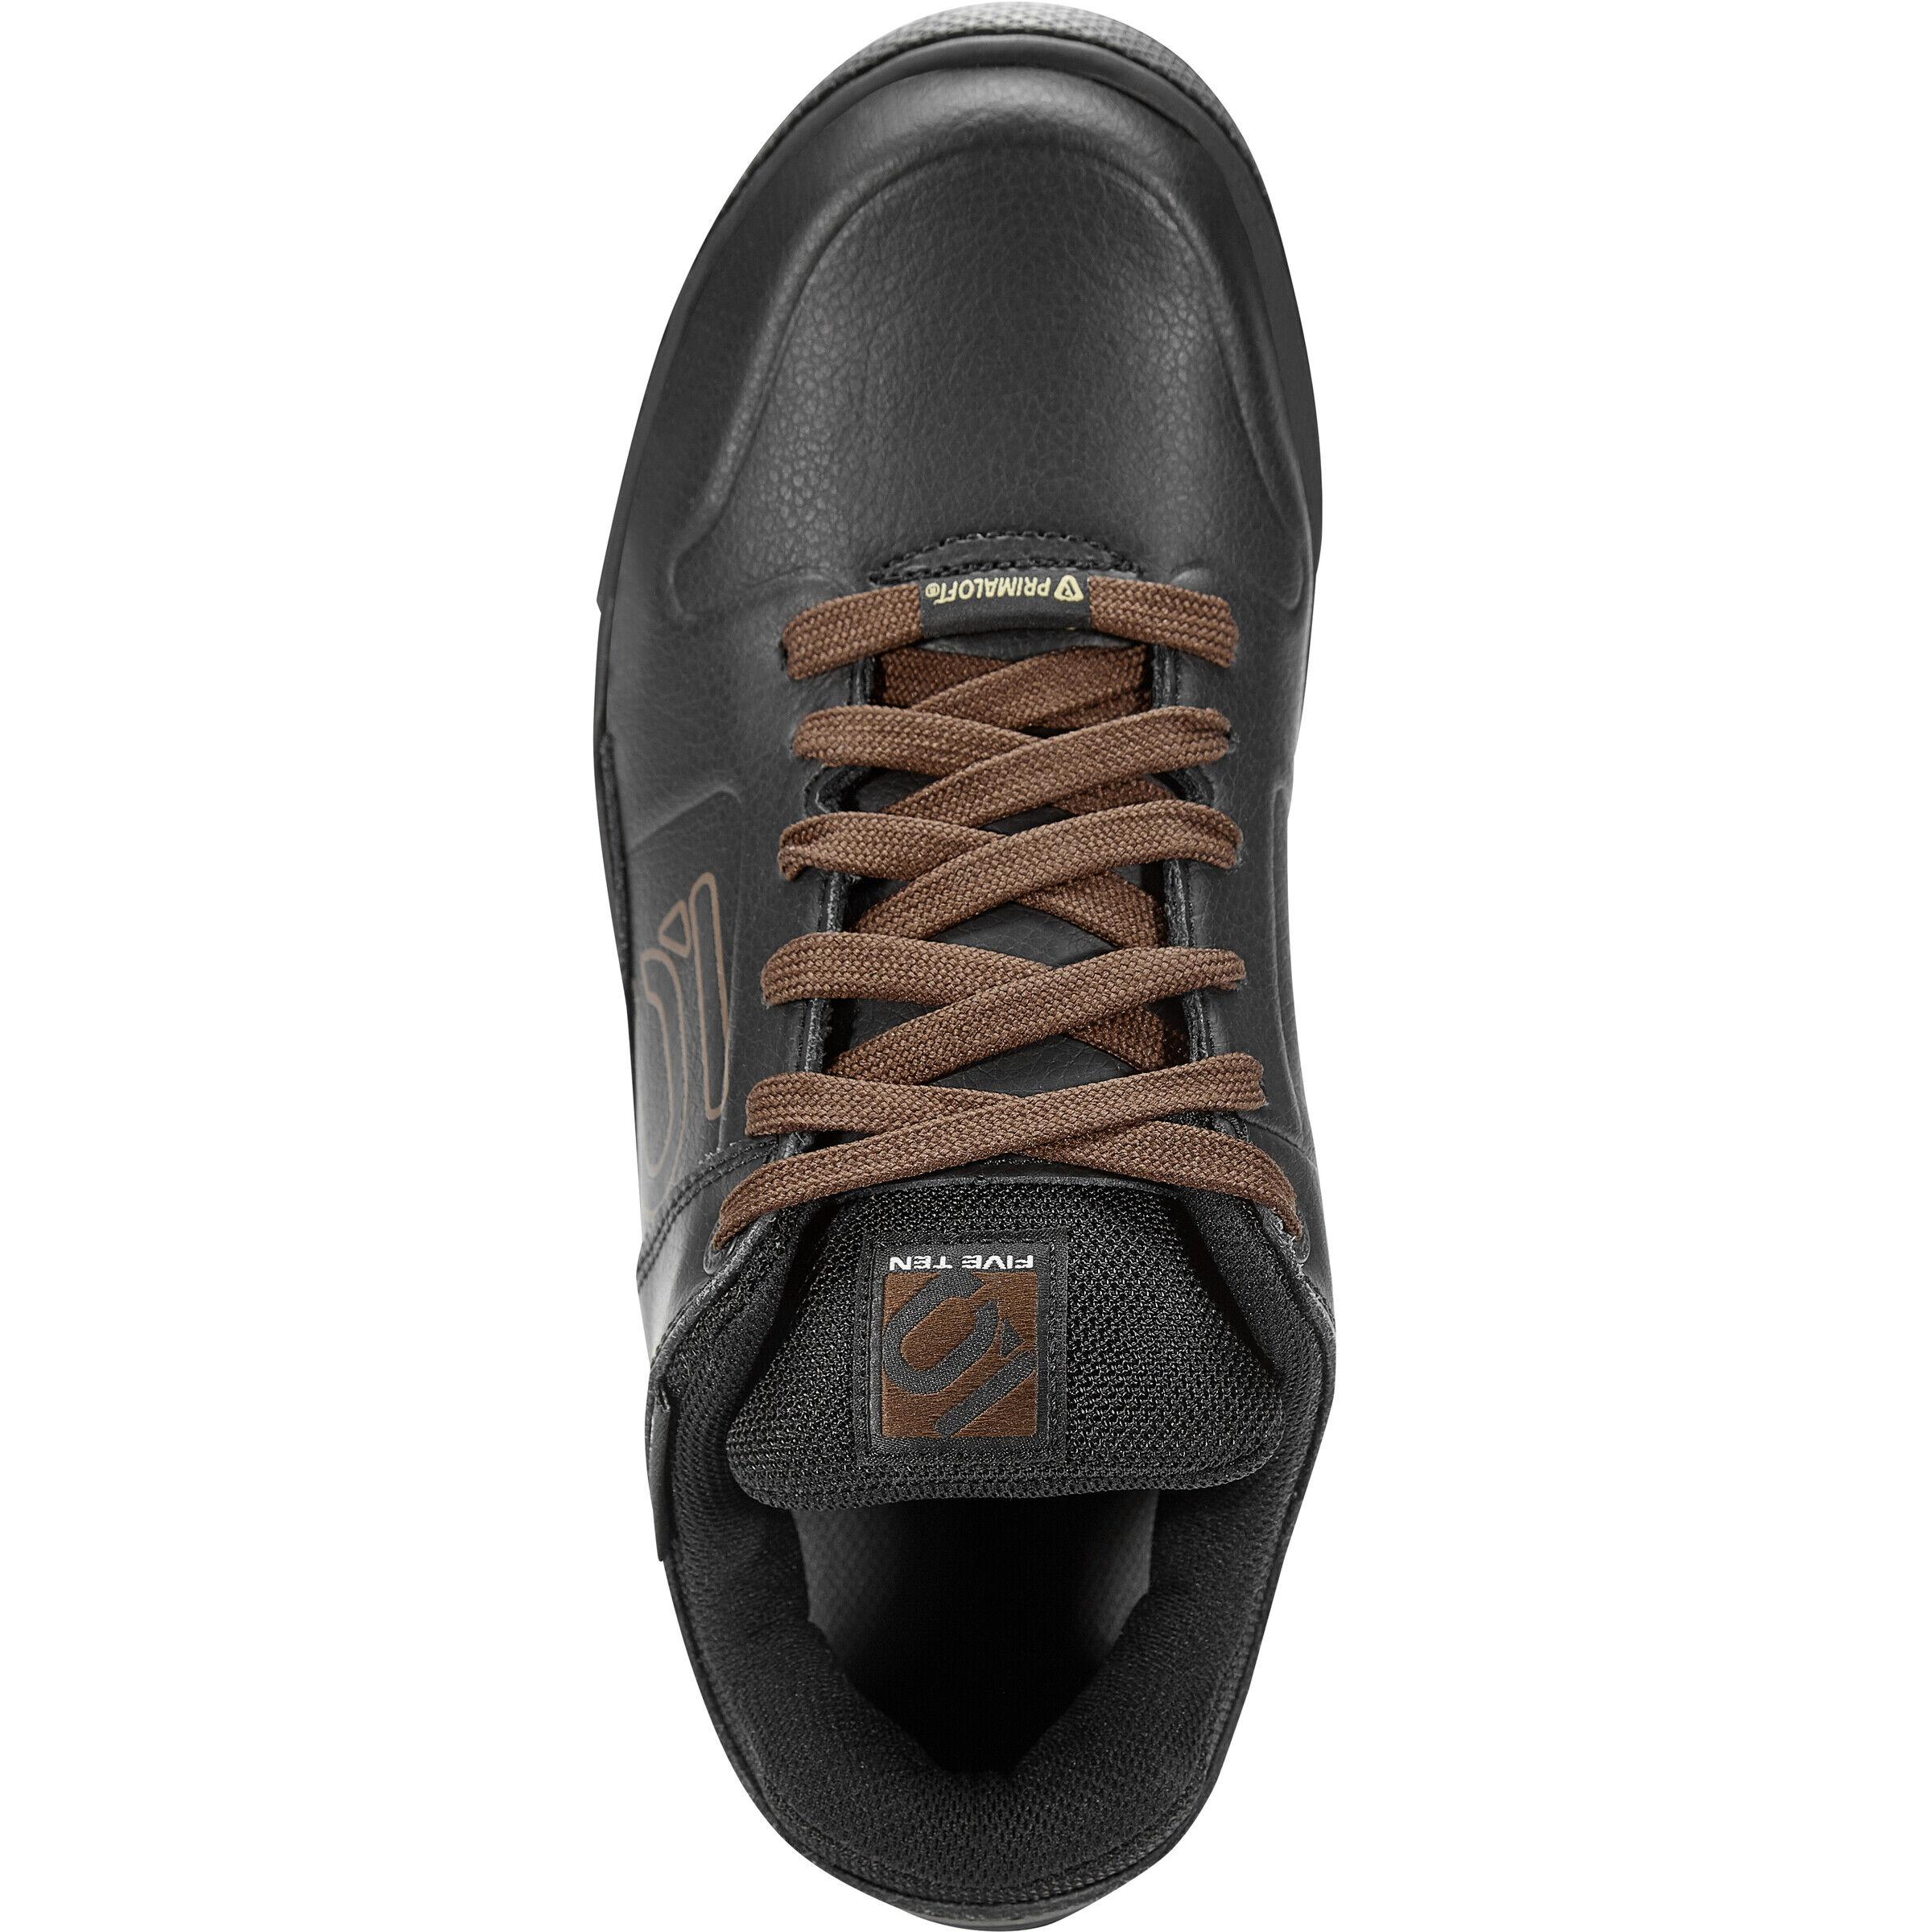 adidas Five Ten Freerider EPS Low Cut Schuhe Herren core blackbrownfootwear white